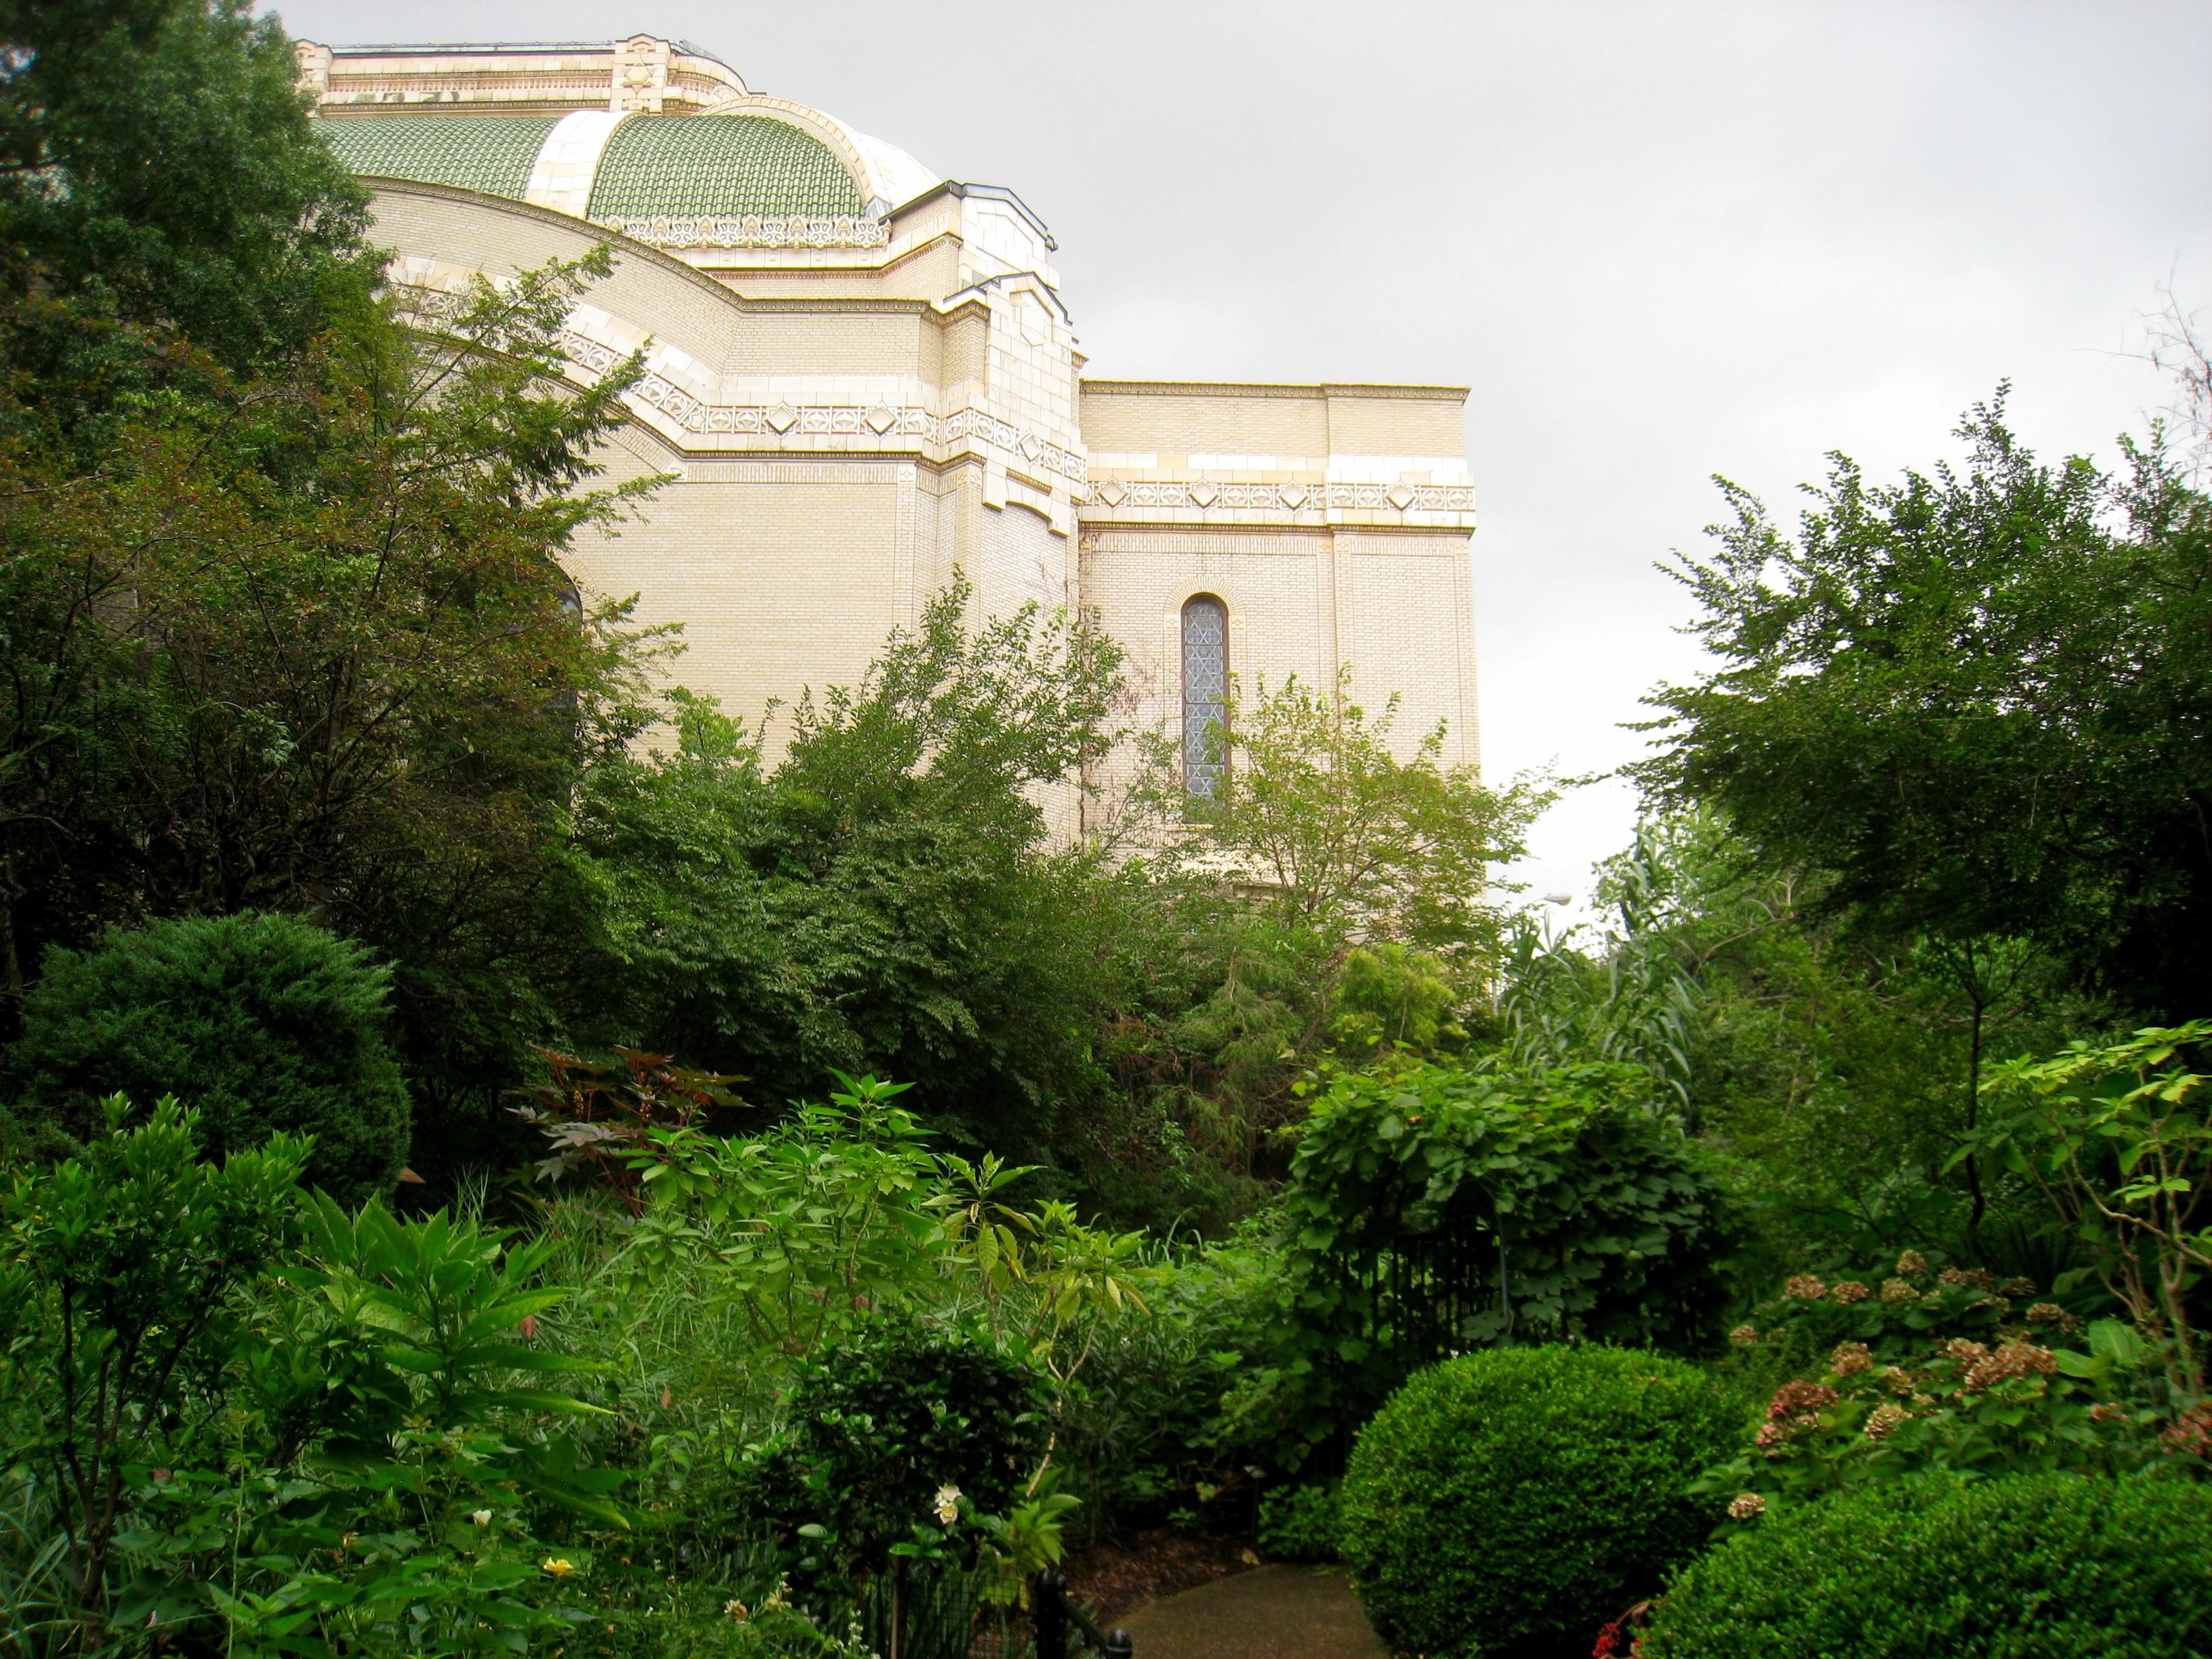 Rodef Shalom Biblical Botanical Garden Garden Ftempo